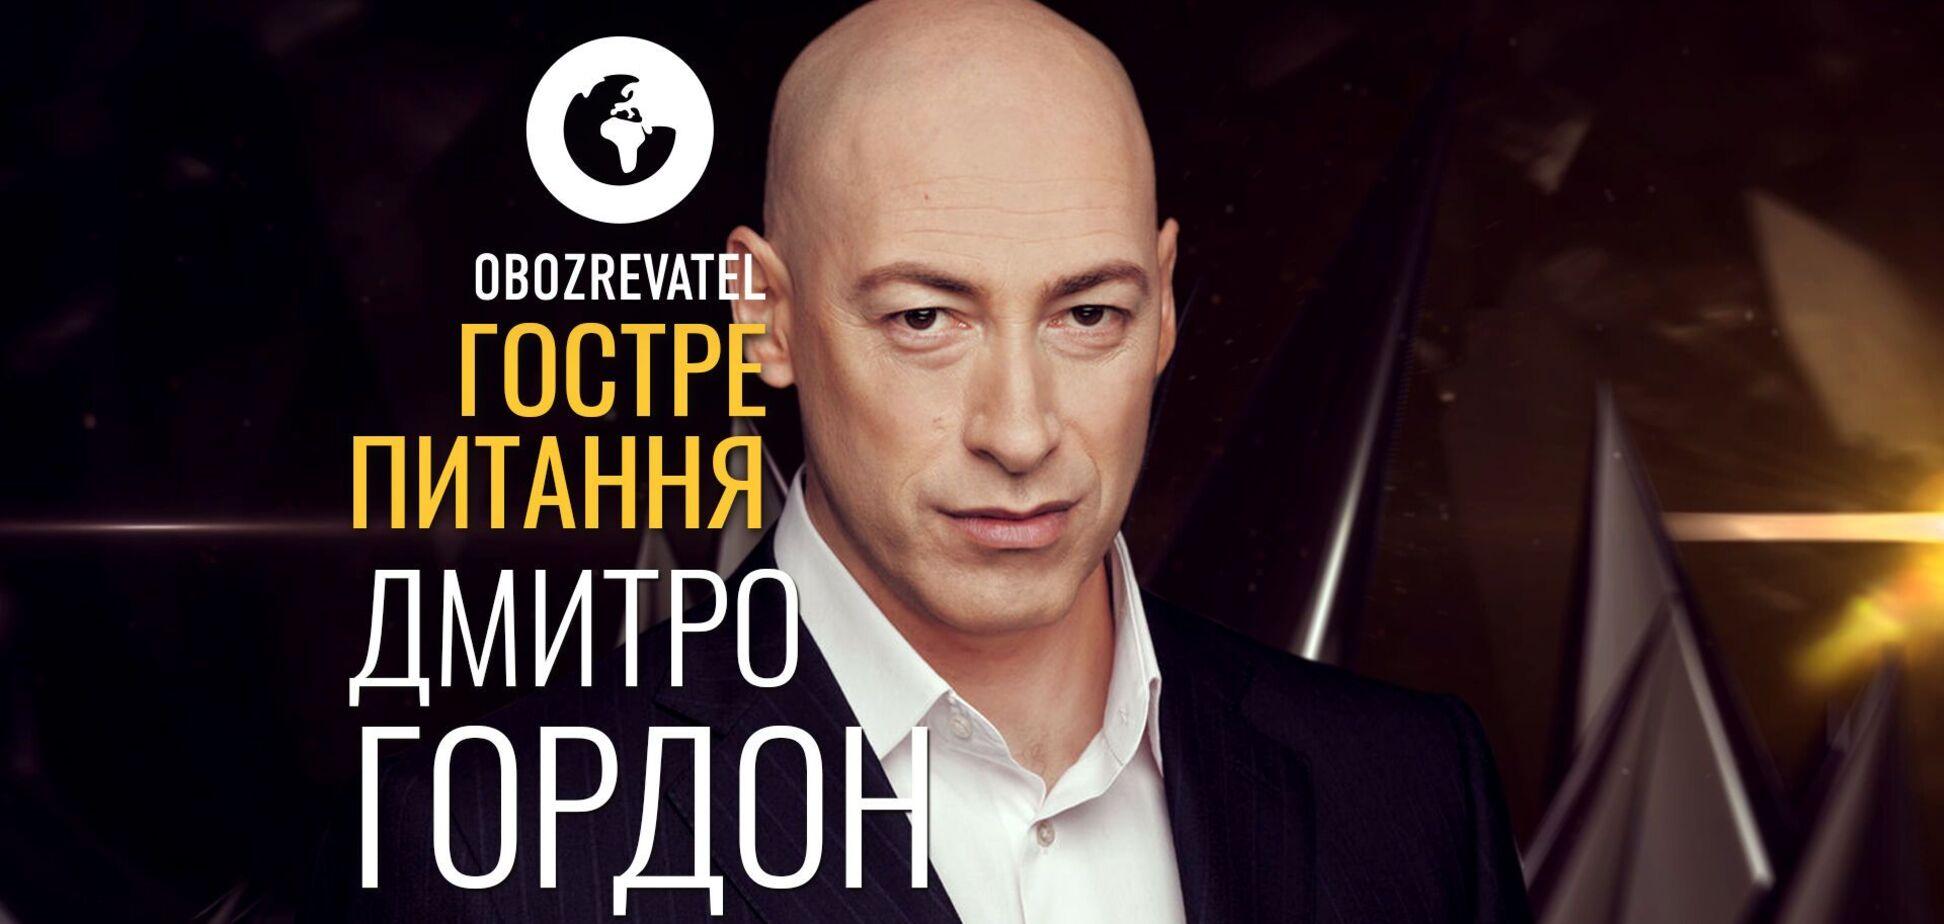 Дмитро Гордон | Гостре питання